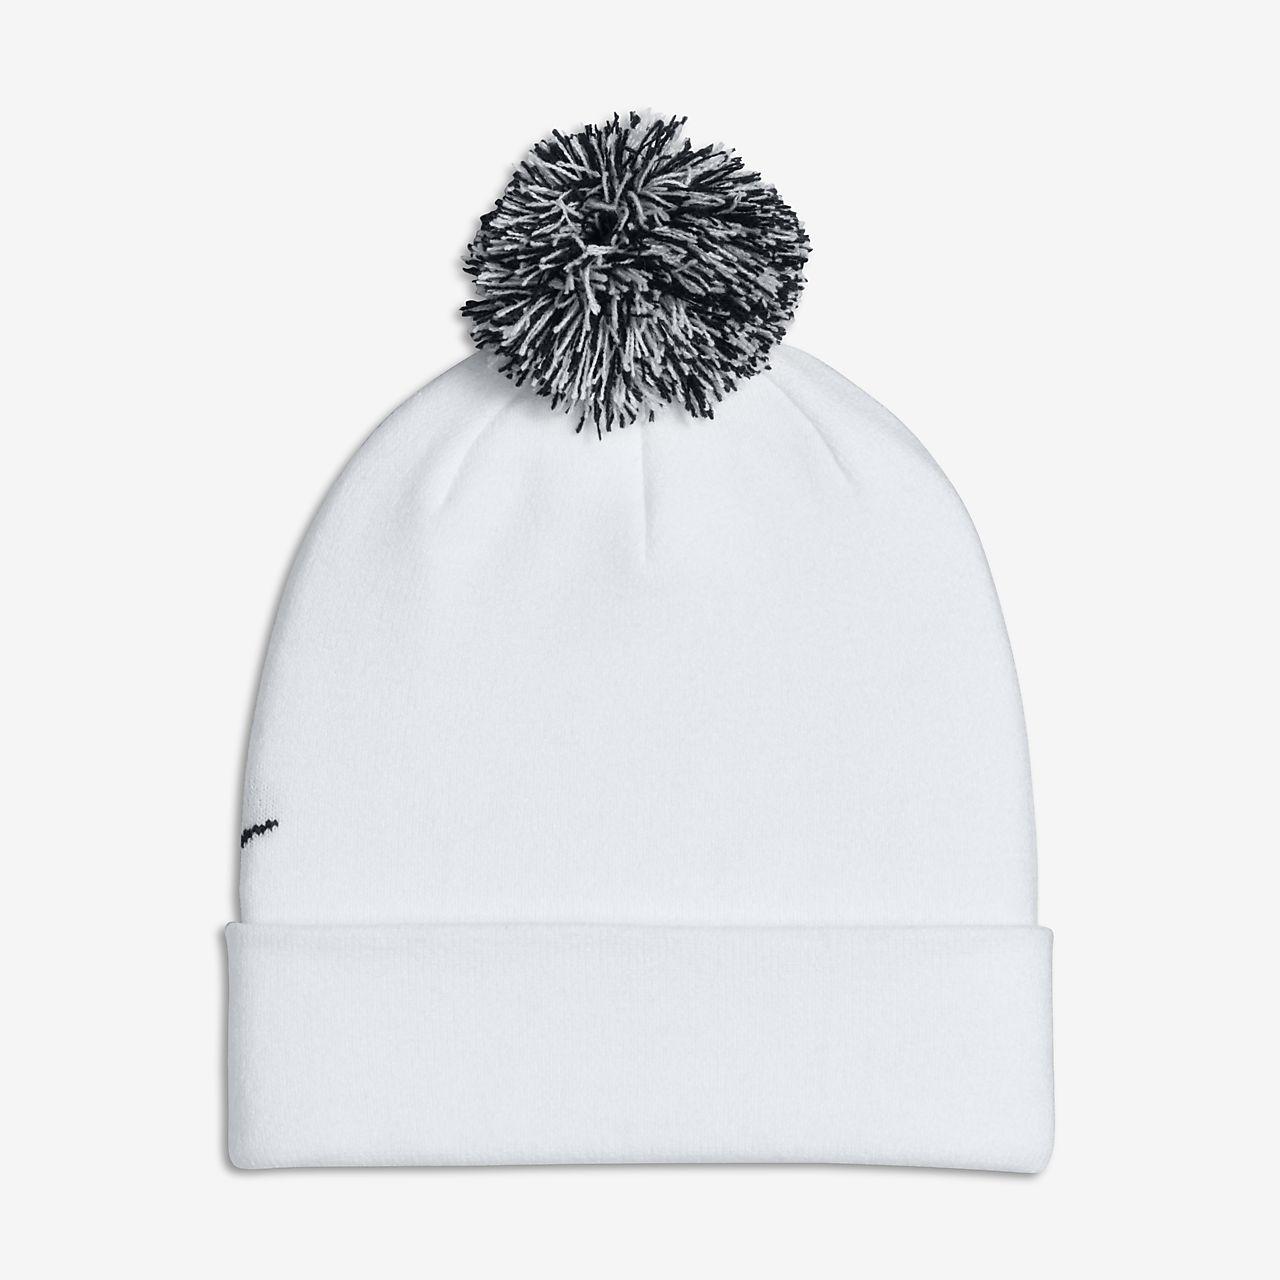 5f4e9b5cb69 ... coupon for nike sportswear pom beanie big kids knit hat 298af 79a0e